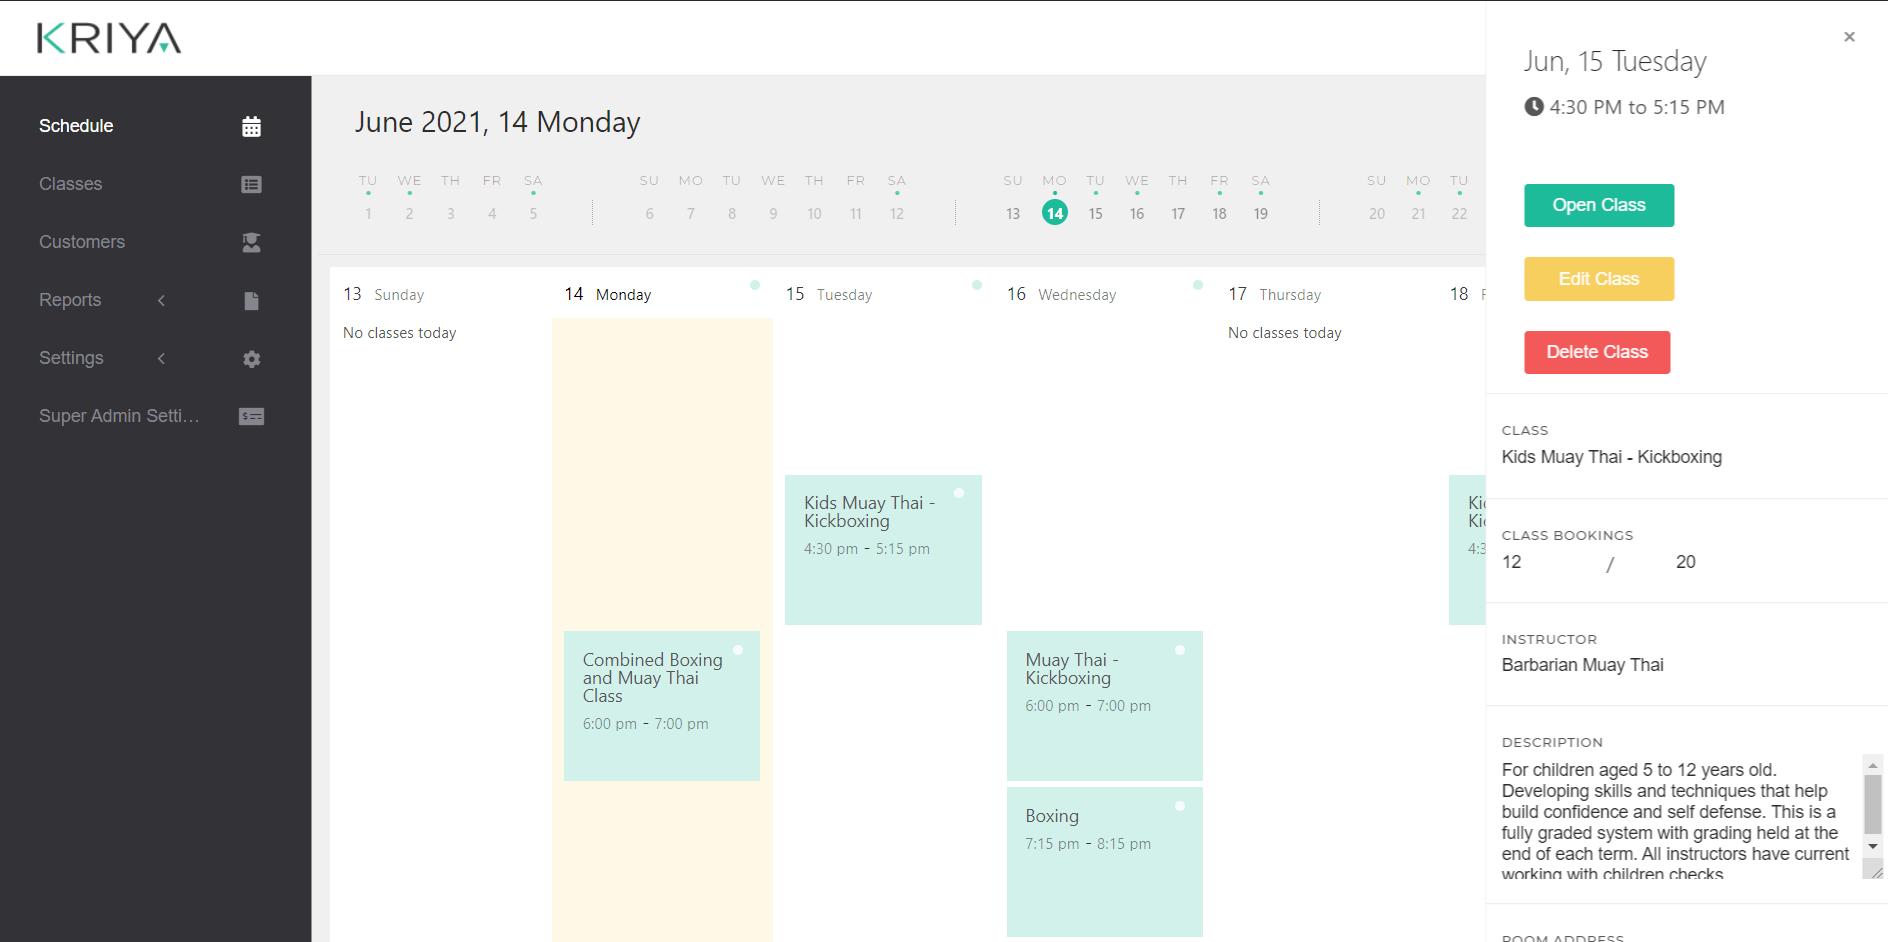 Muay Thai Kickboxing Schedule - KRIYA Software